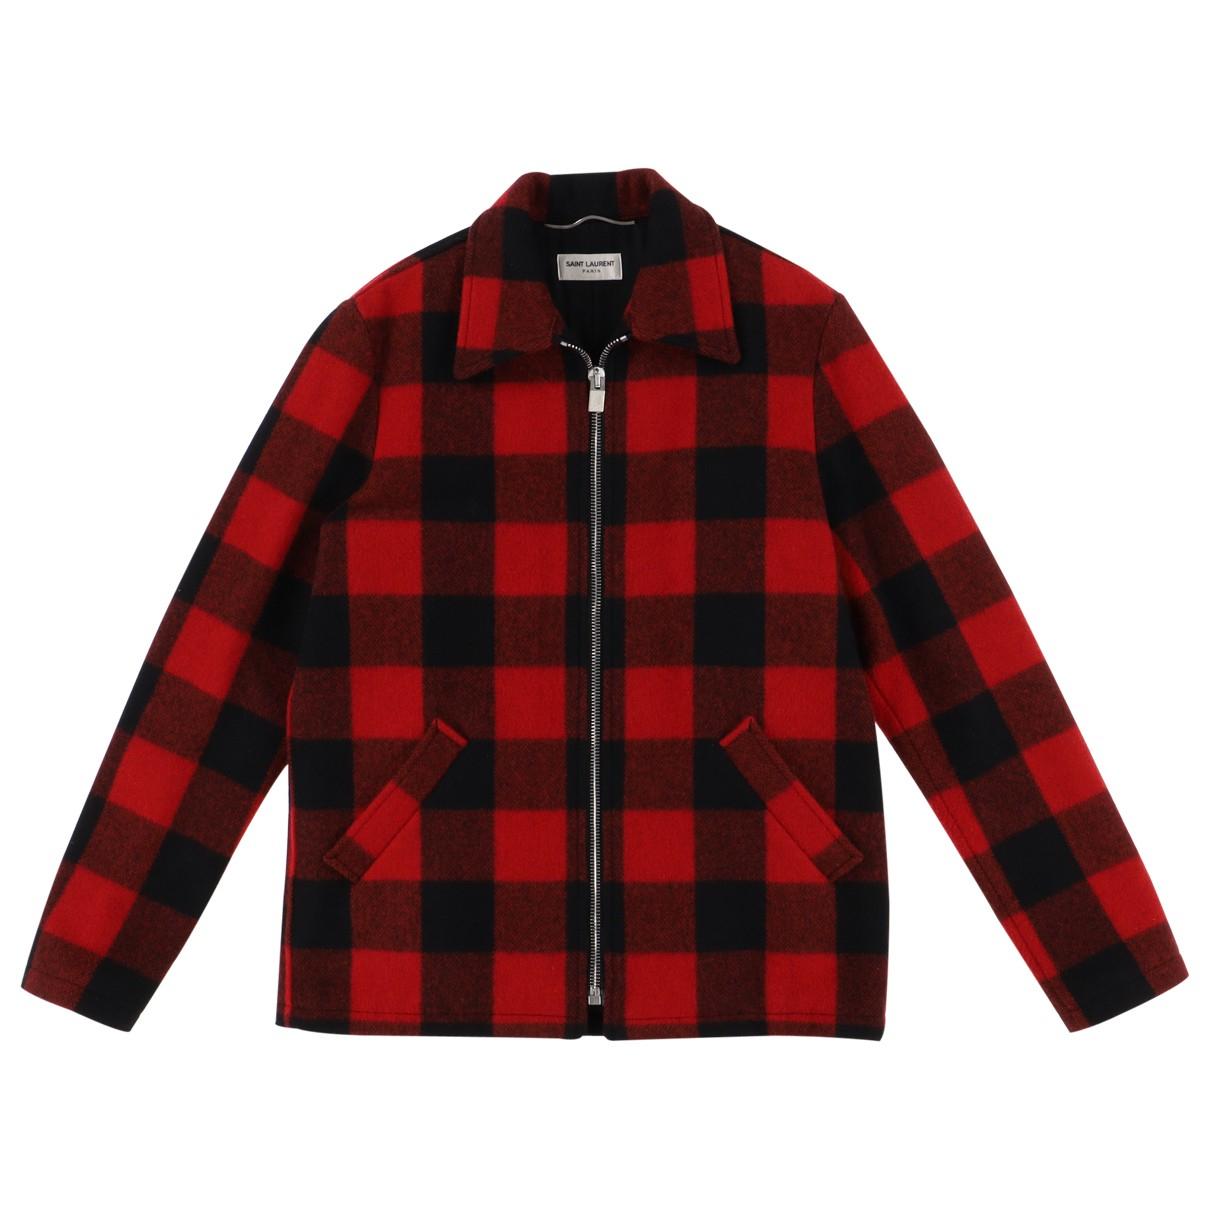 Saint Laurent N Red Wool jacket  for Men S International